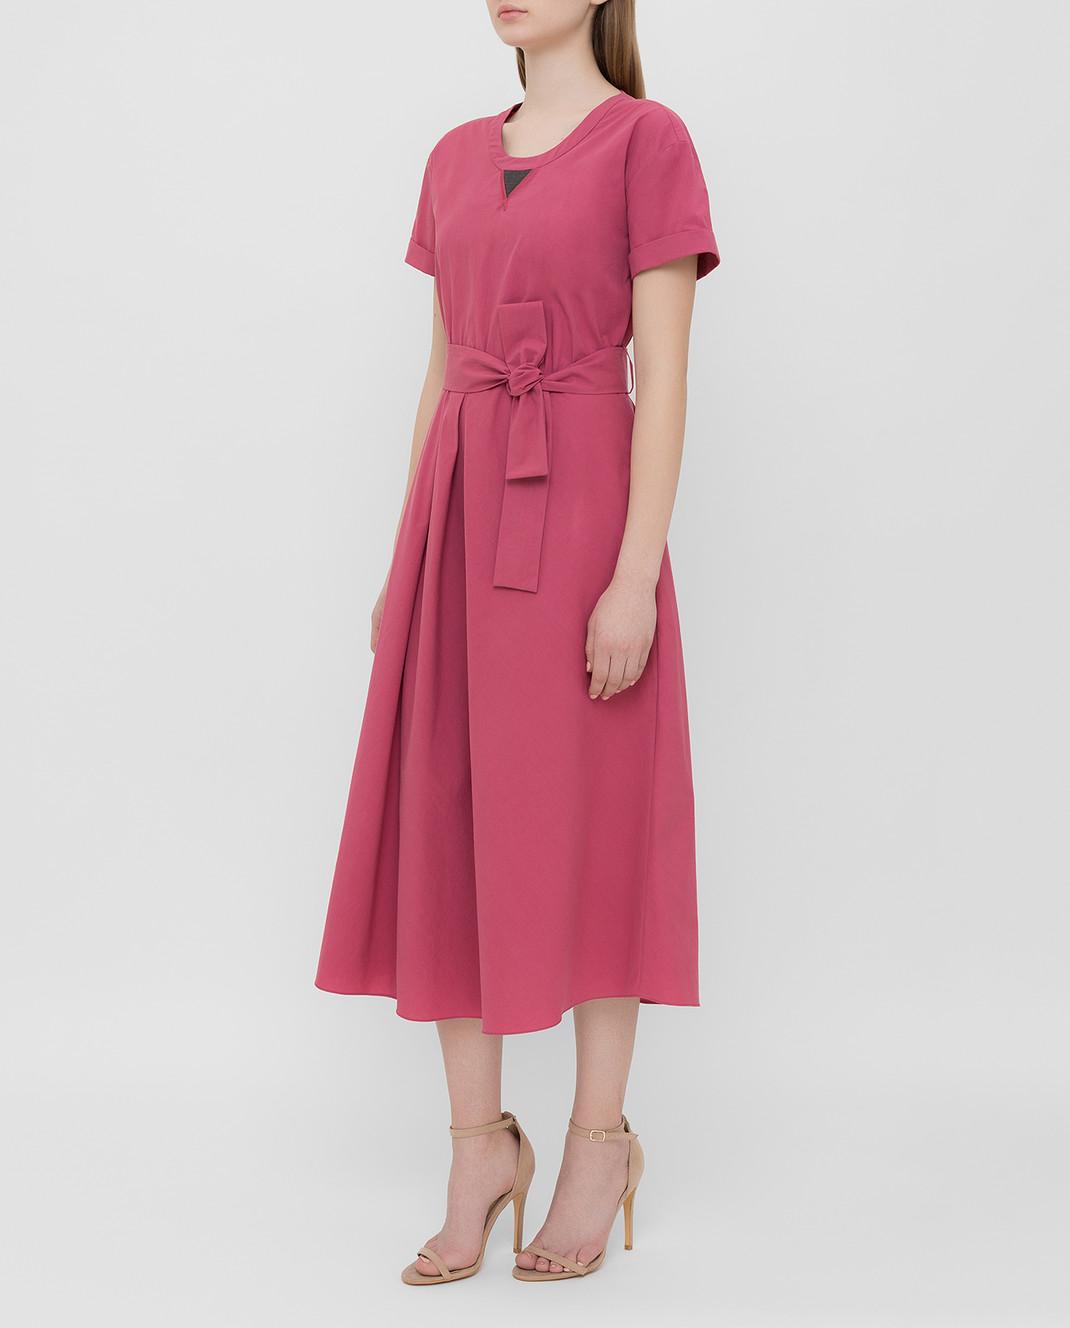 Brunello Cucinelli Розовое платье MH127ABV72 изображение 3